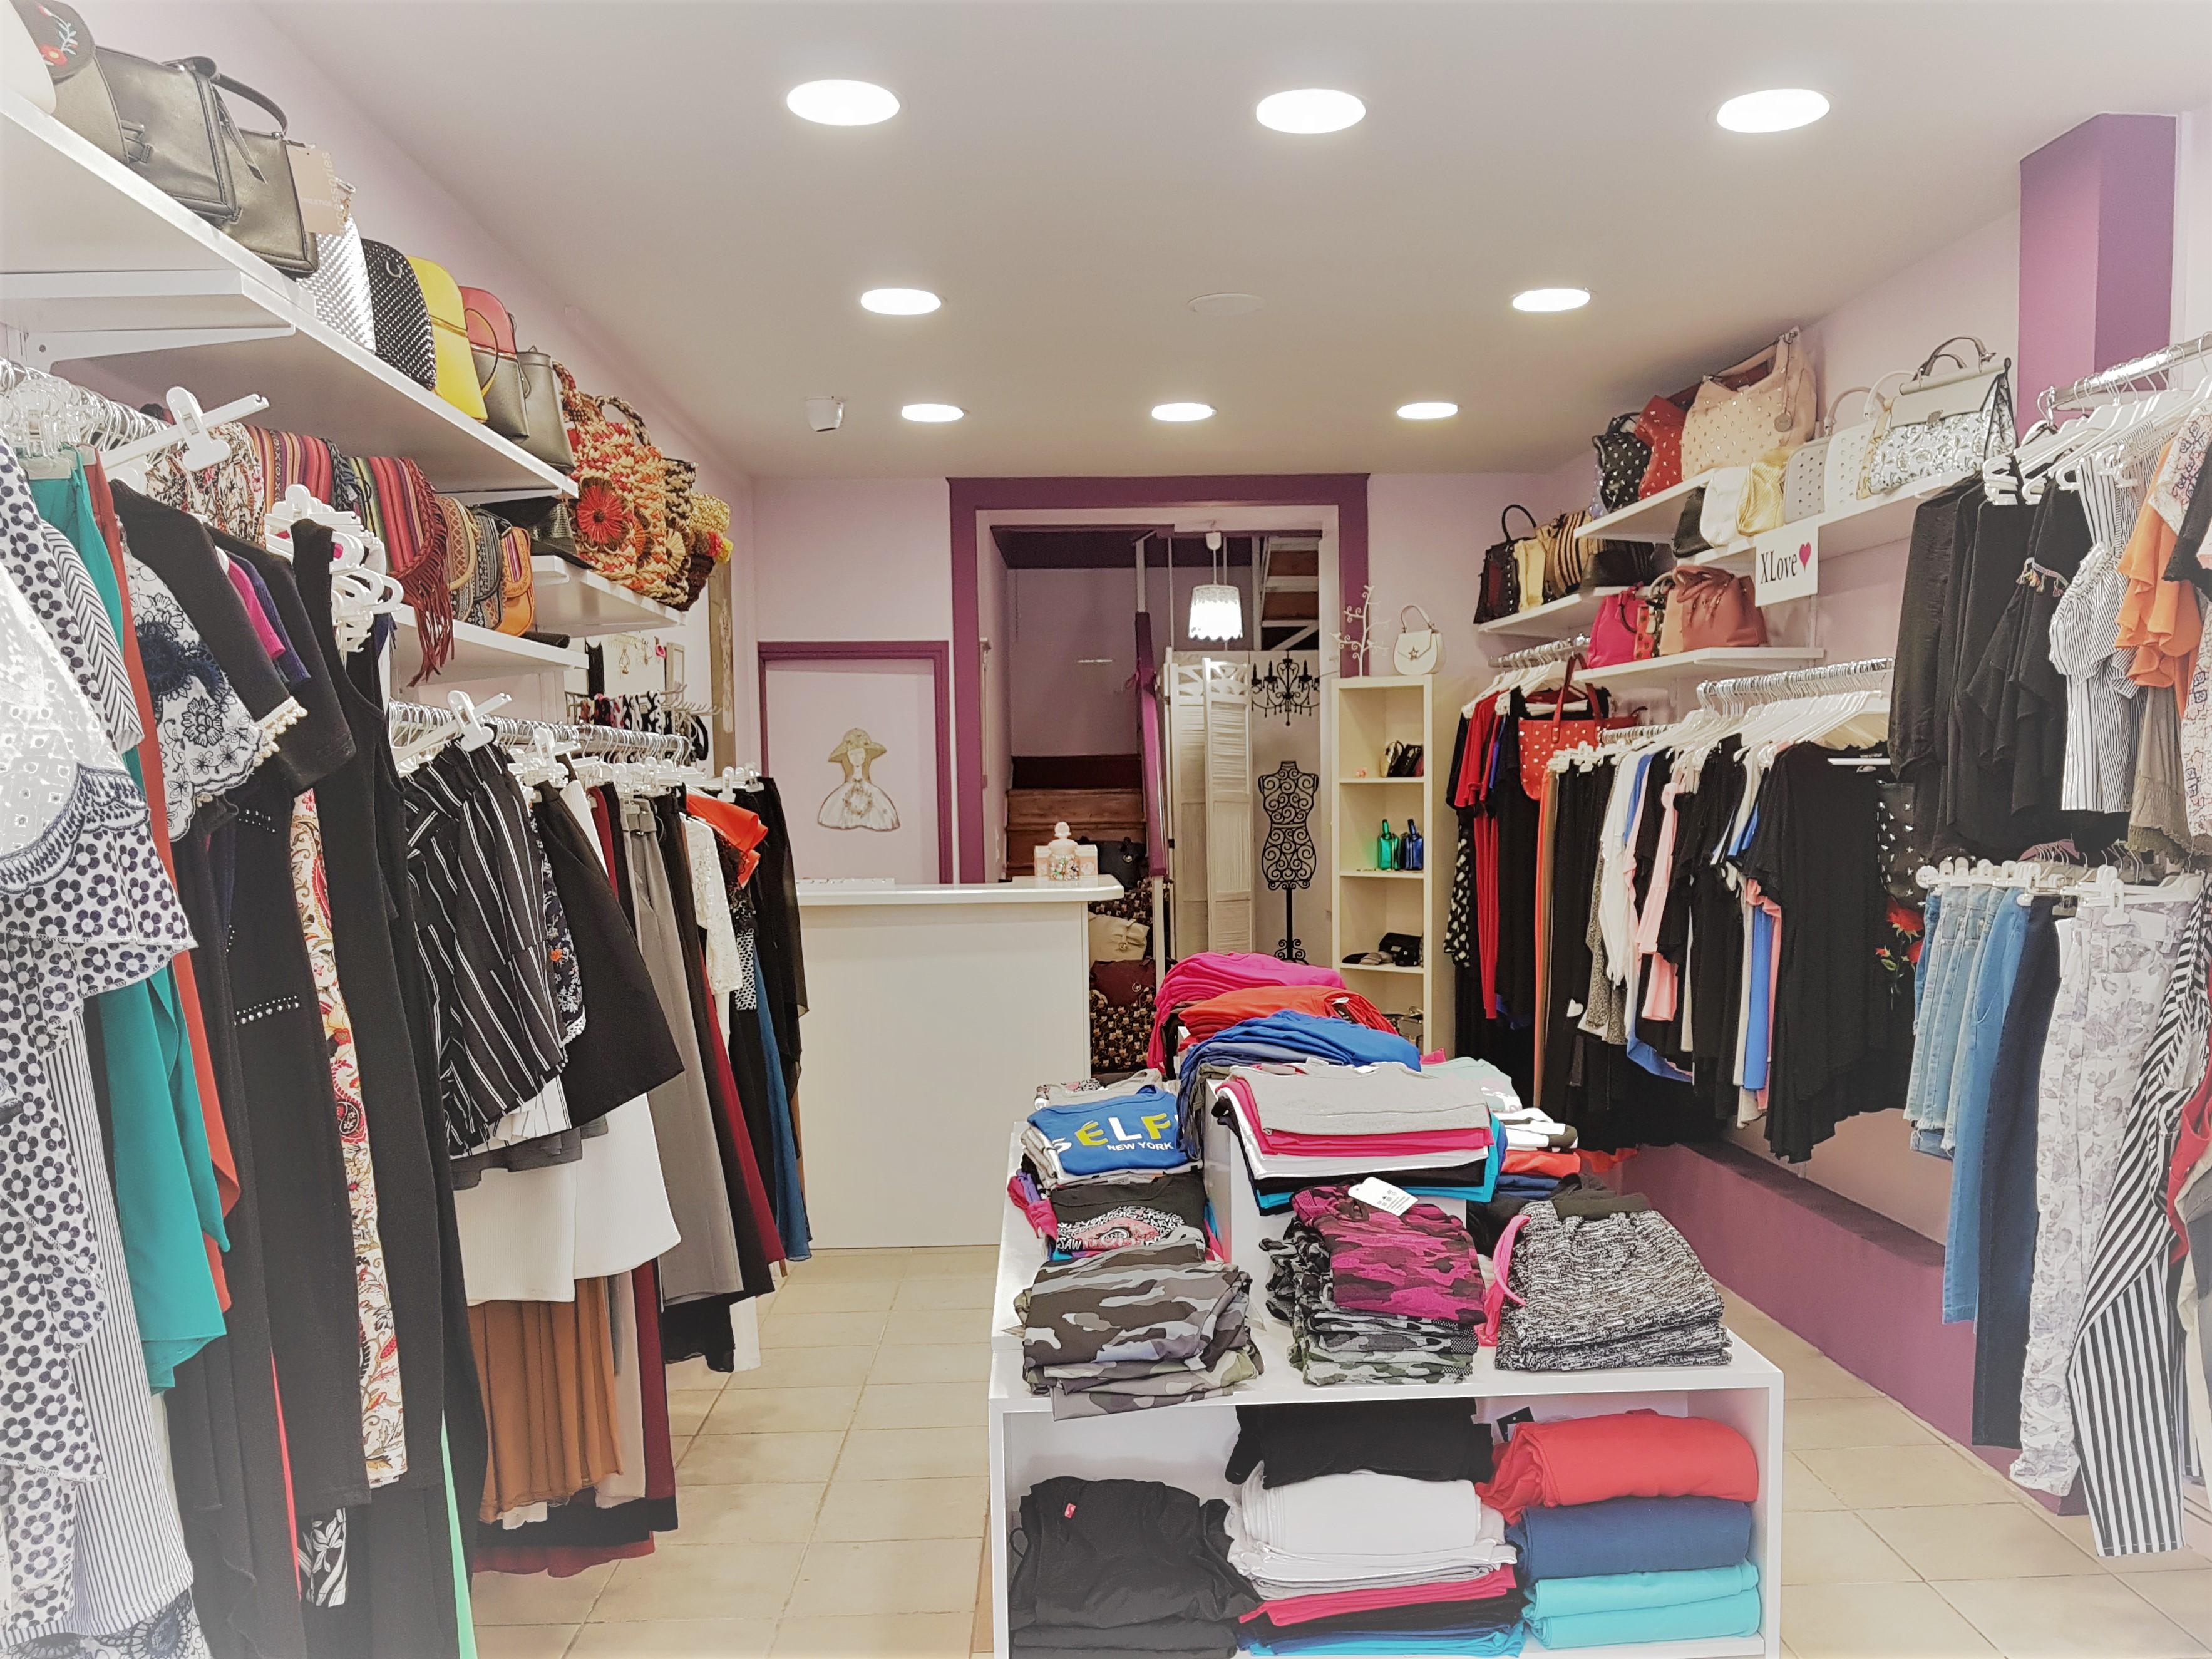 d836070c070 StaVid store: Γυναικεία ρούχα και αξεσουάρ για κάθε σώμα και κάθε ...